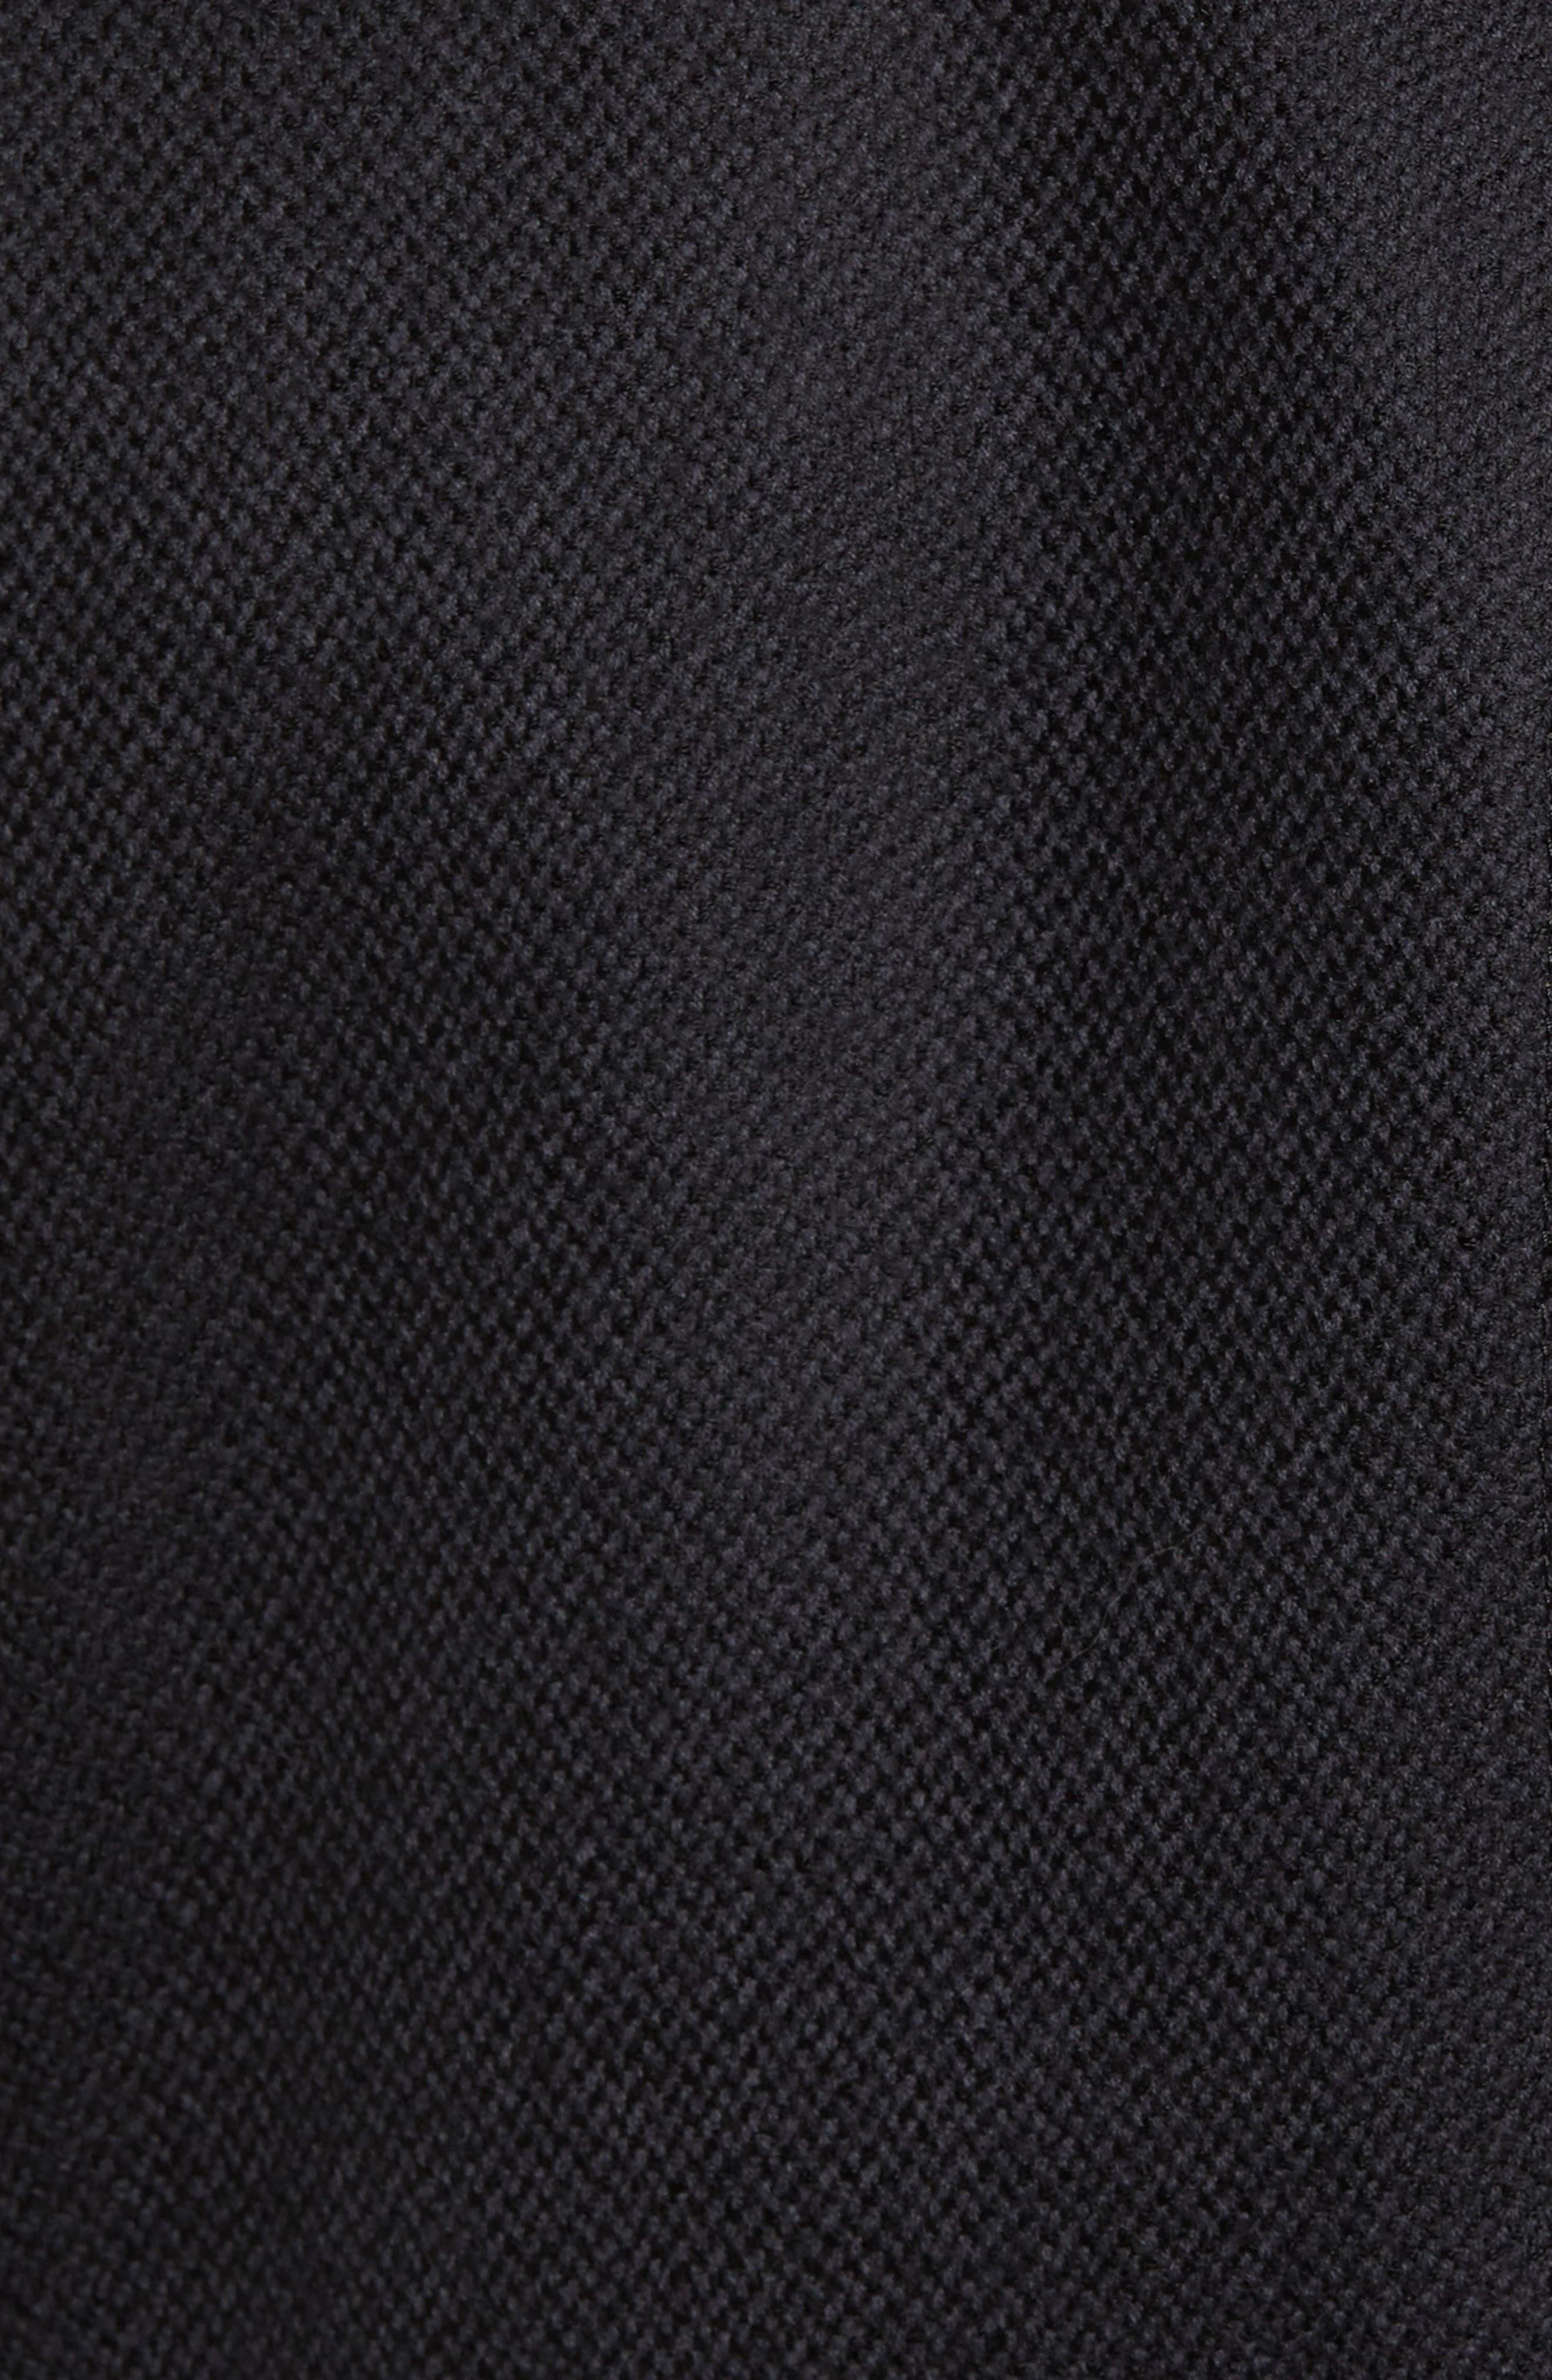 Ritchie Aim Hybrid Classic Fit Wool & Cashmere Sport Coat,                             Alternate thumbnail 5, color,                             Black